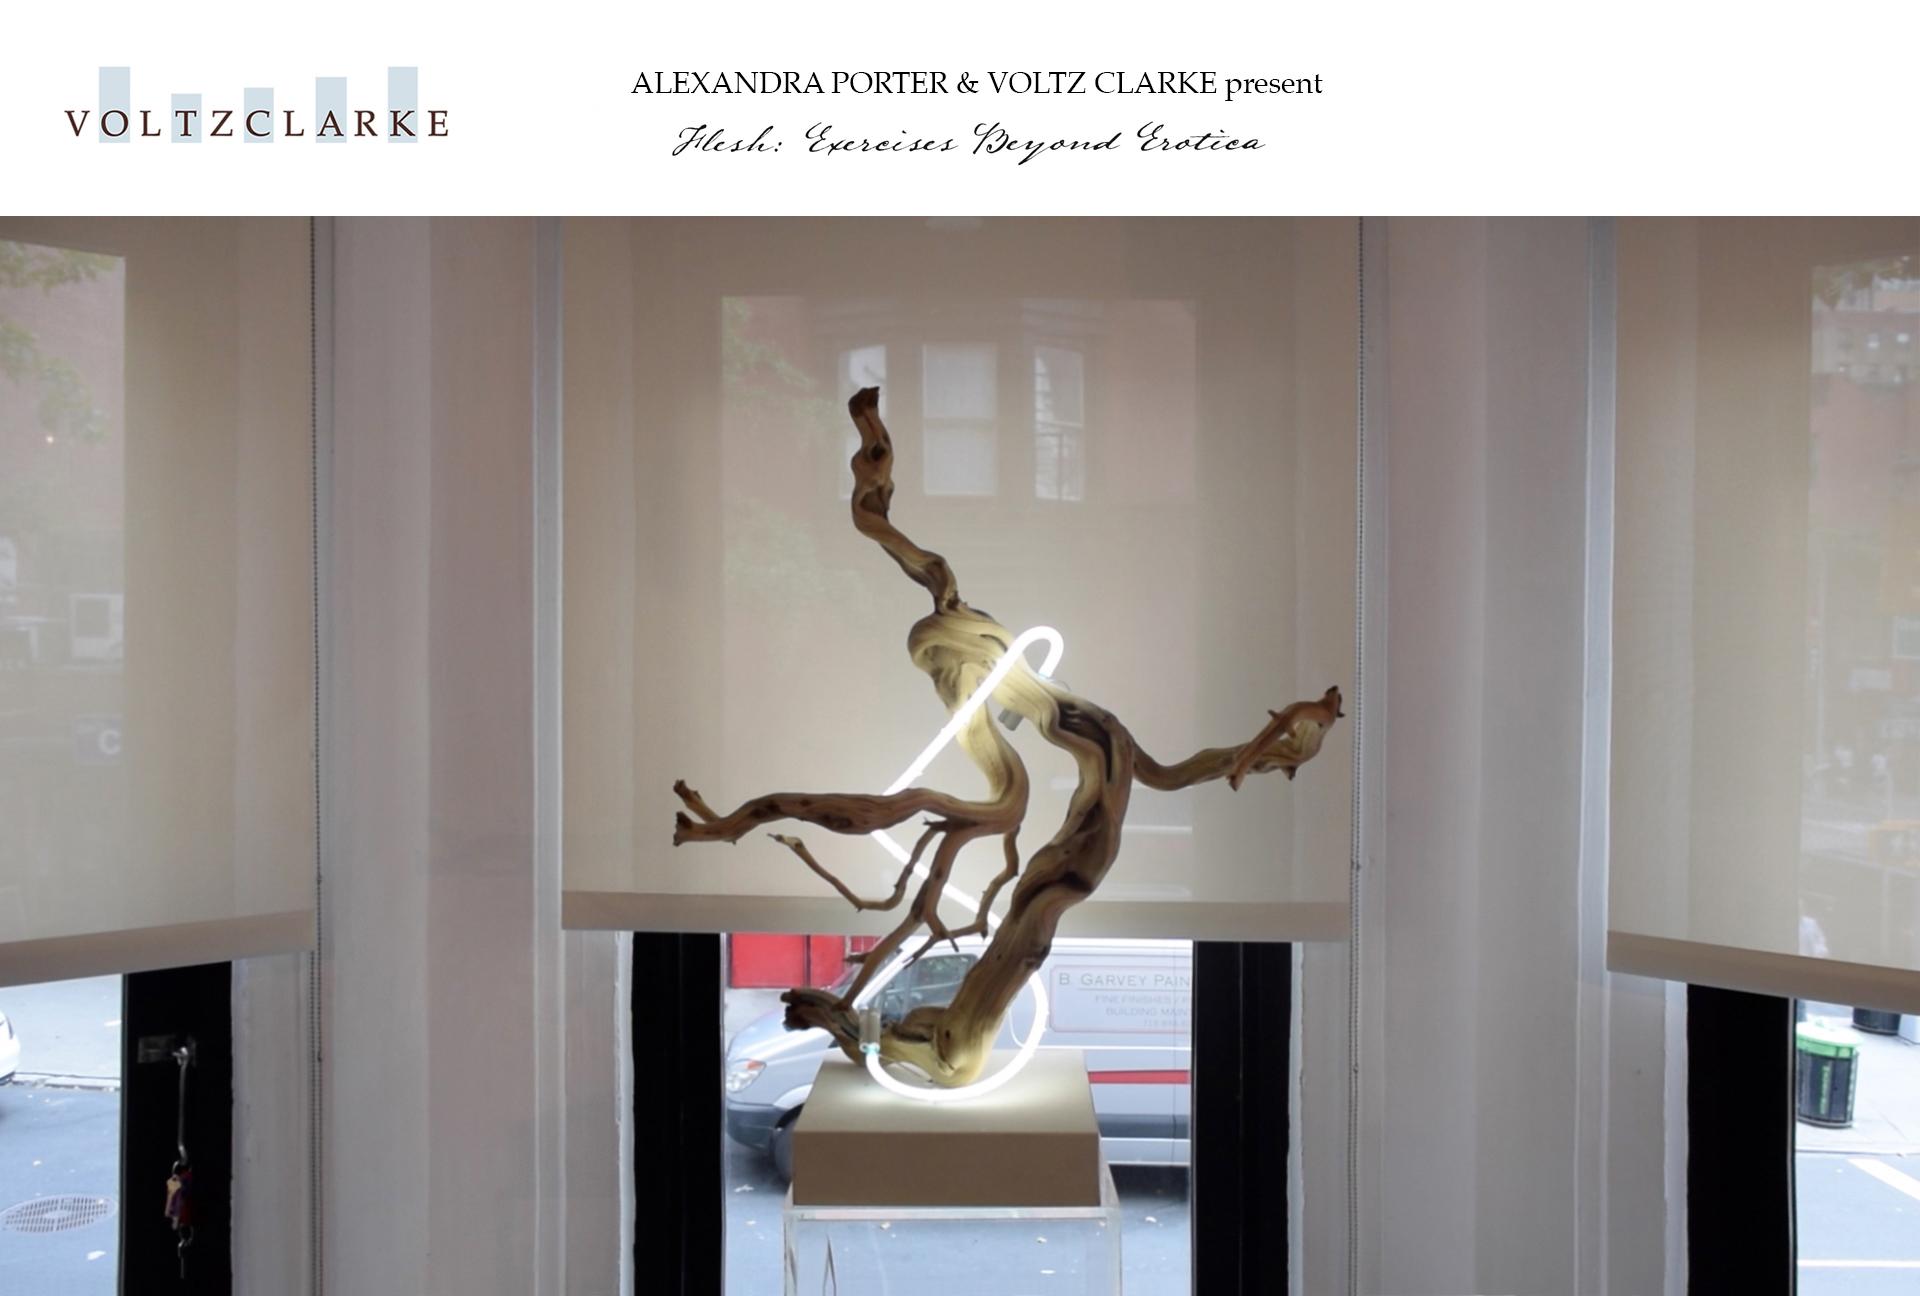 sculpture by Lisa Schulte